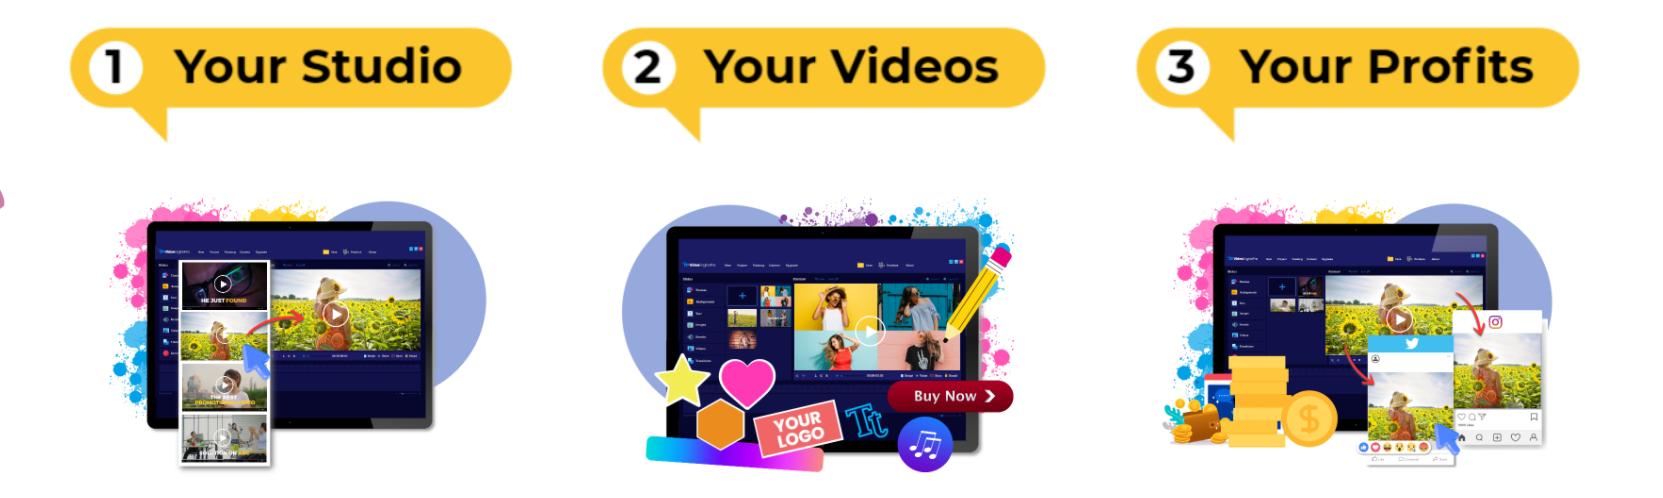 VideoEnginePro steps